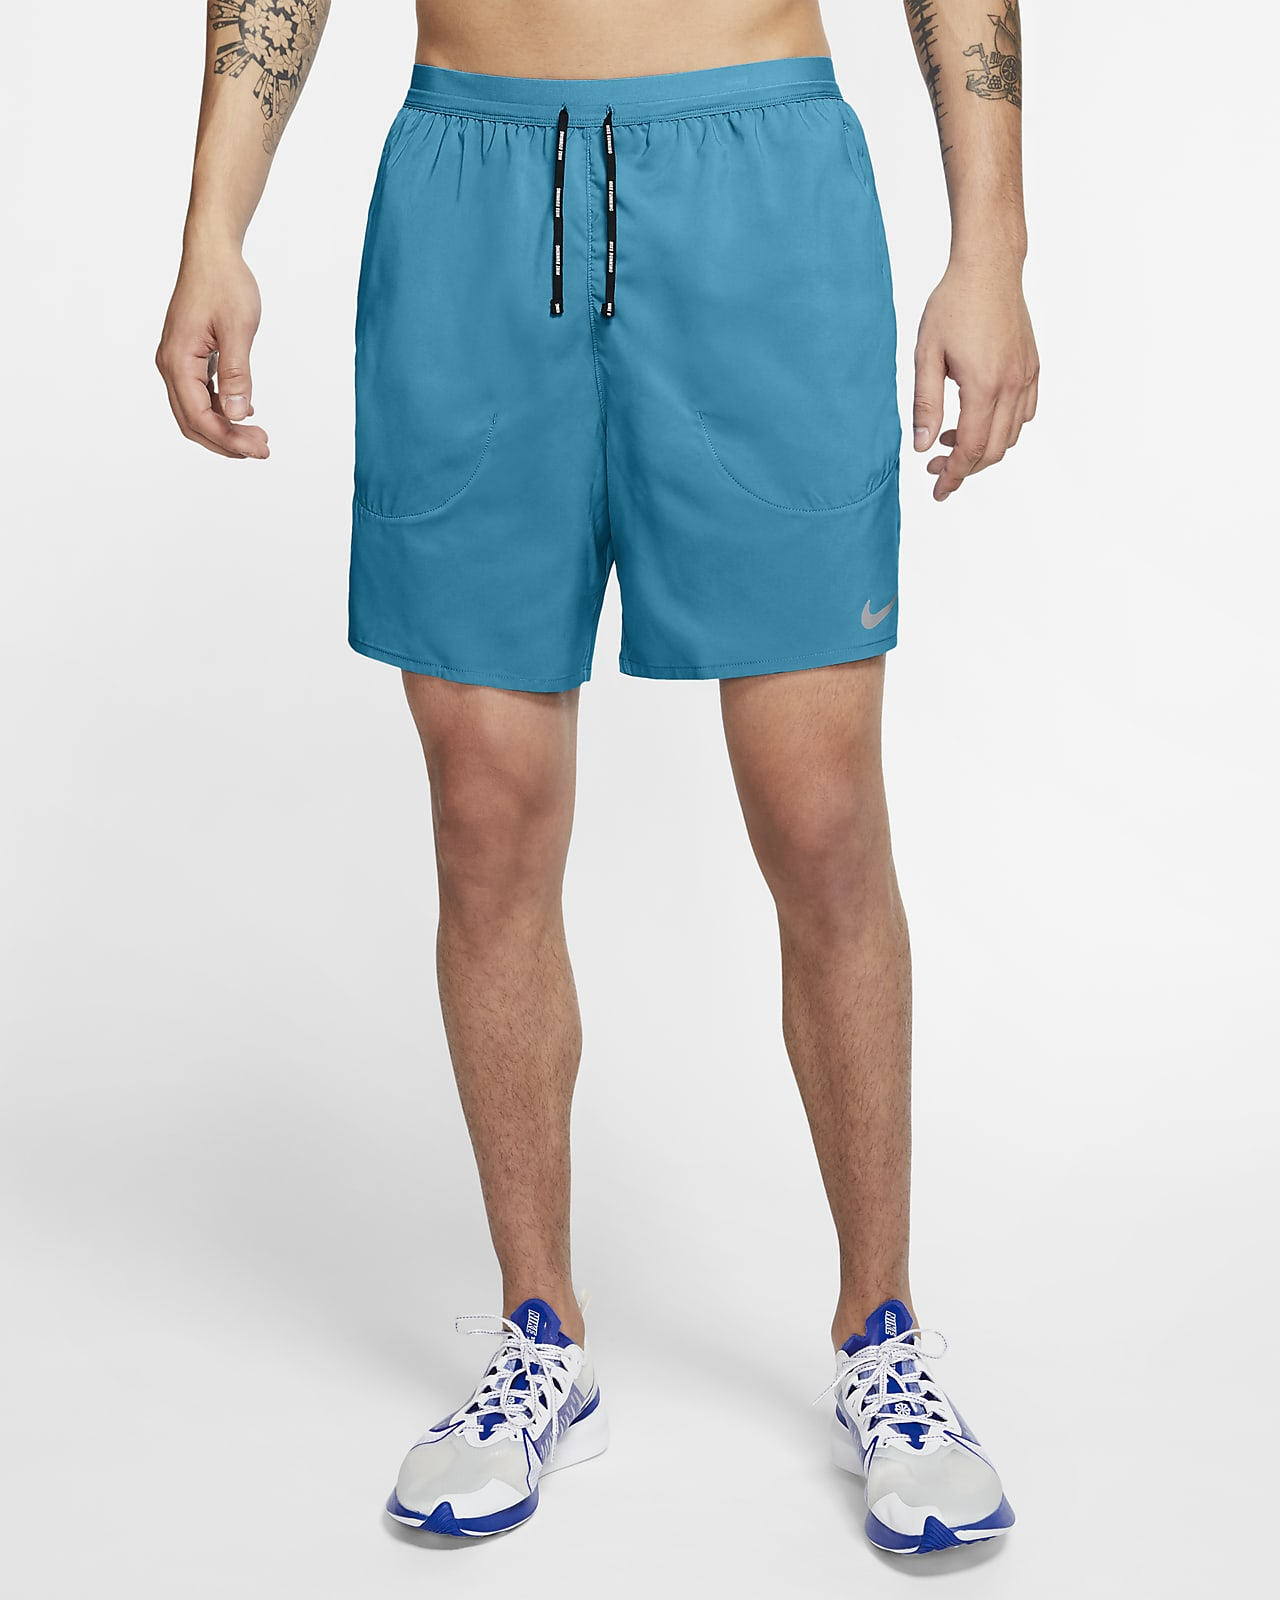 Nike Flex Stride 18 cm Slip Erkek Koşu Şortu